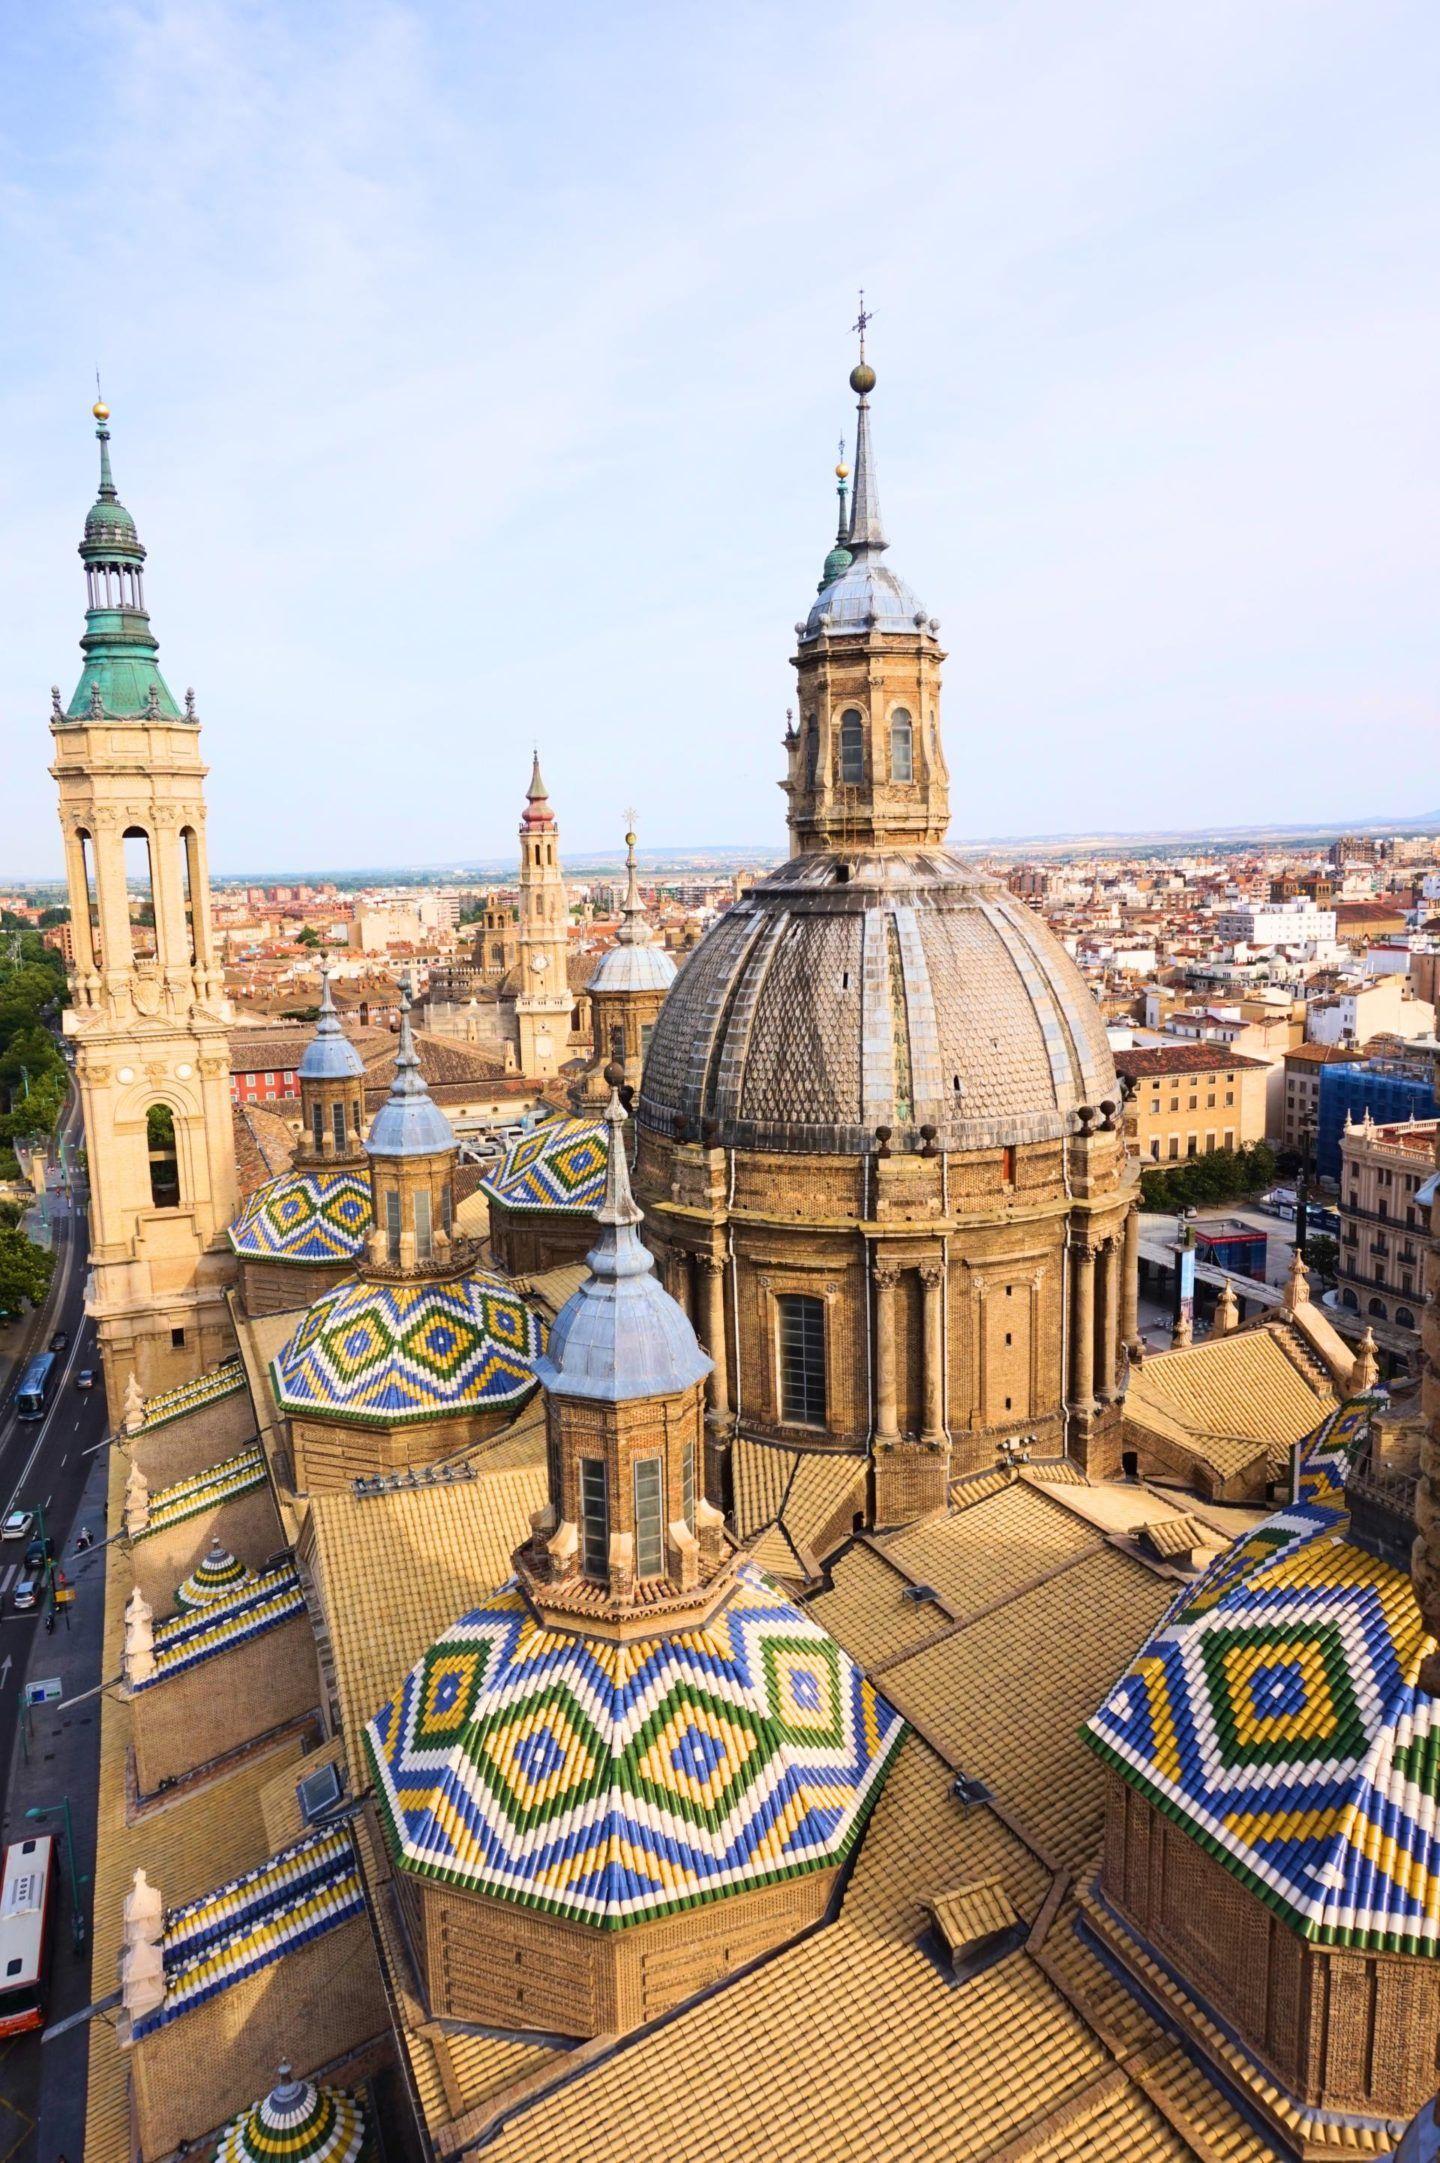 48hour Guide To The Cultural Spanish City Of Zaragoza Zaragoza